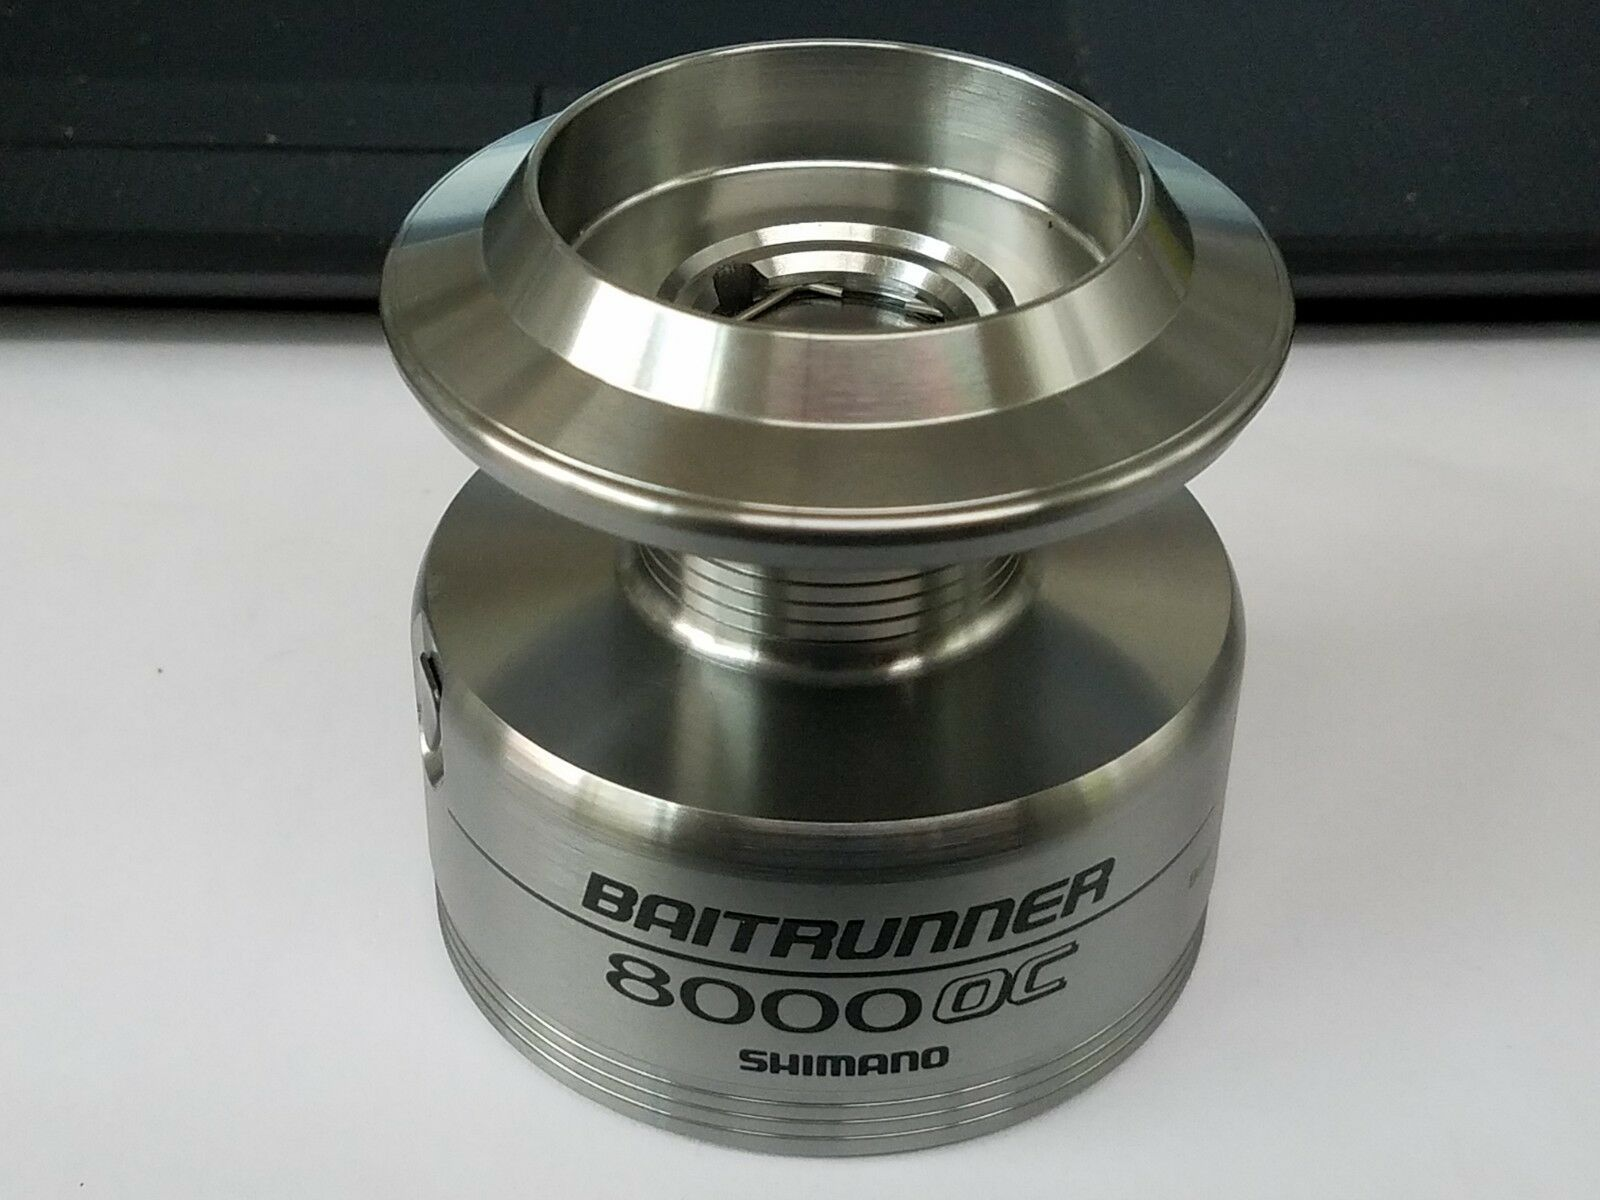 1 Shimano PartRD 15123 Spool Assembly Fits Baitrunner 8000OC BTR-8000OC